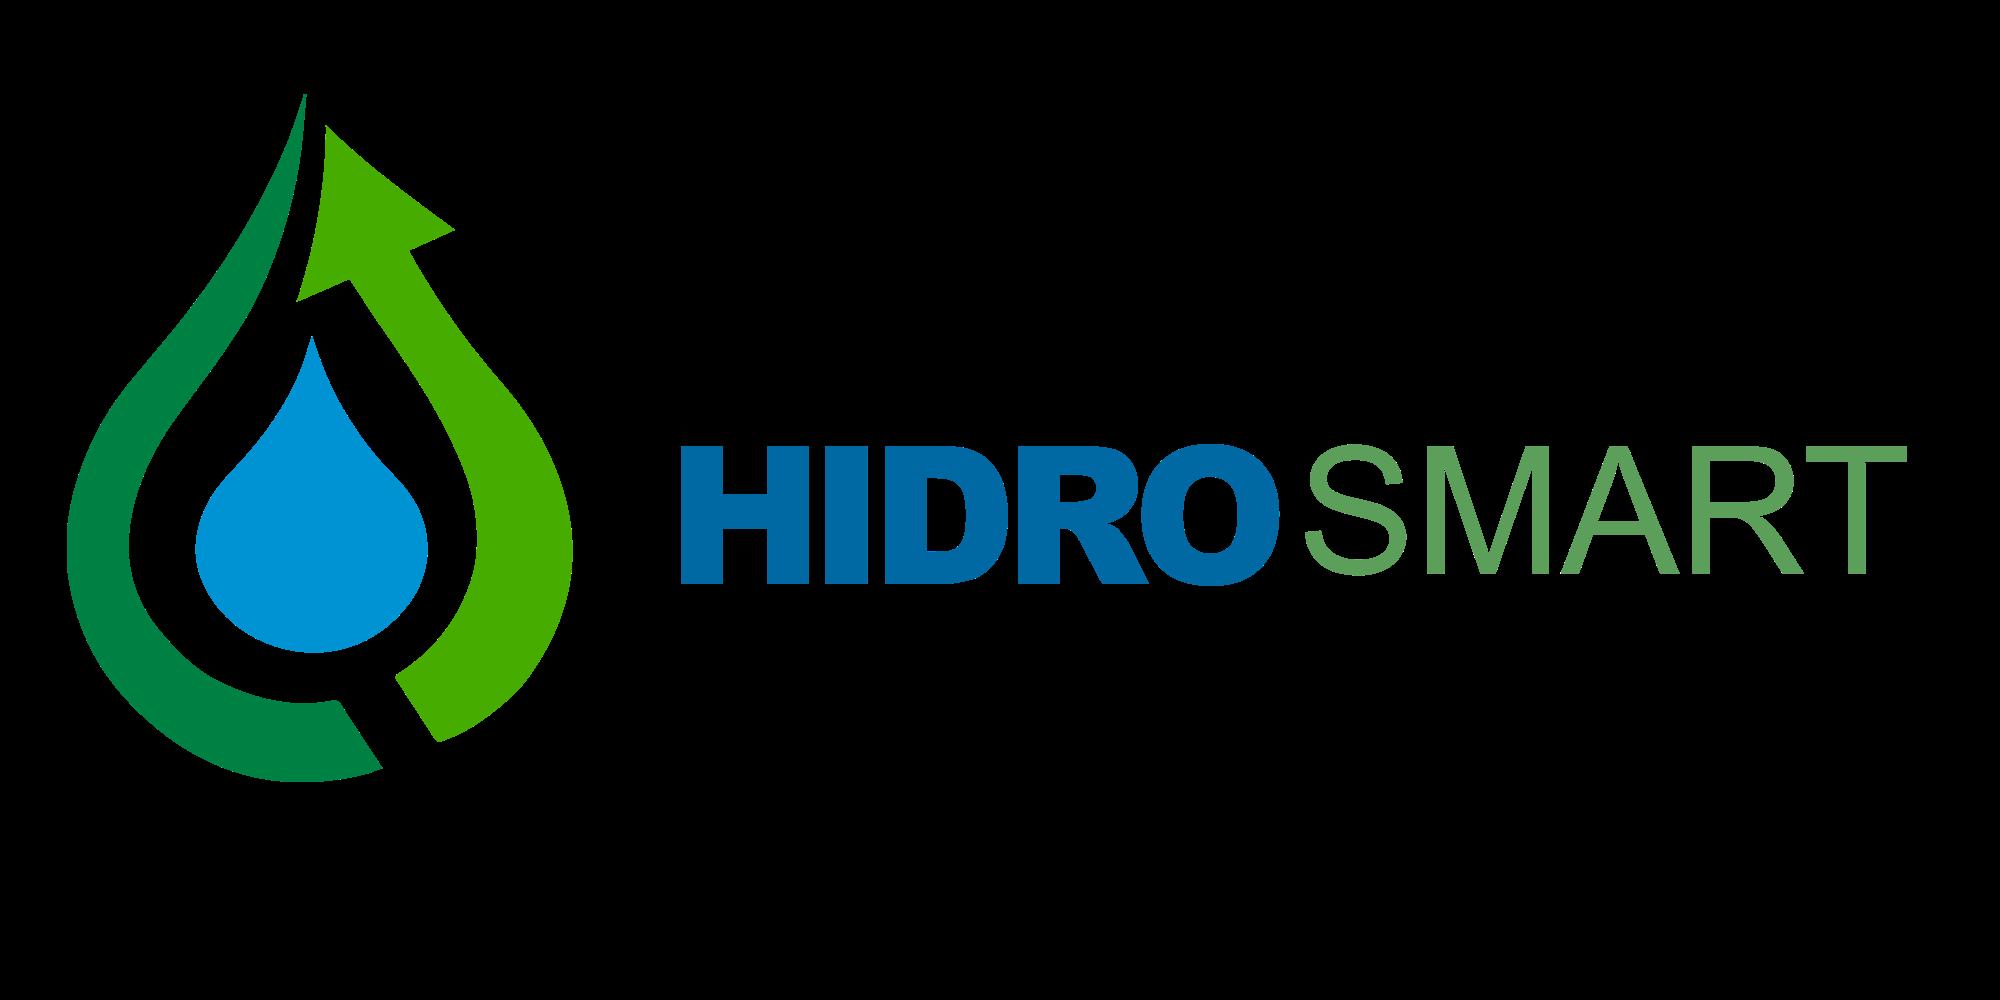 Hidrosmart